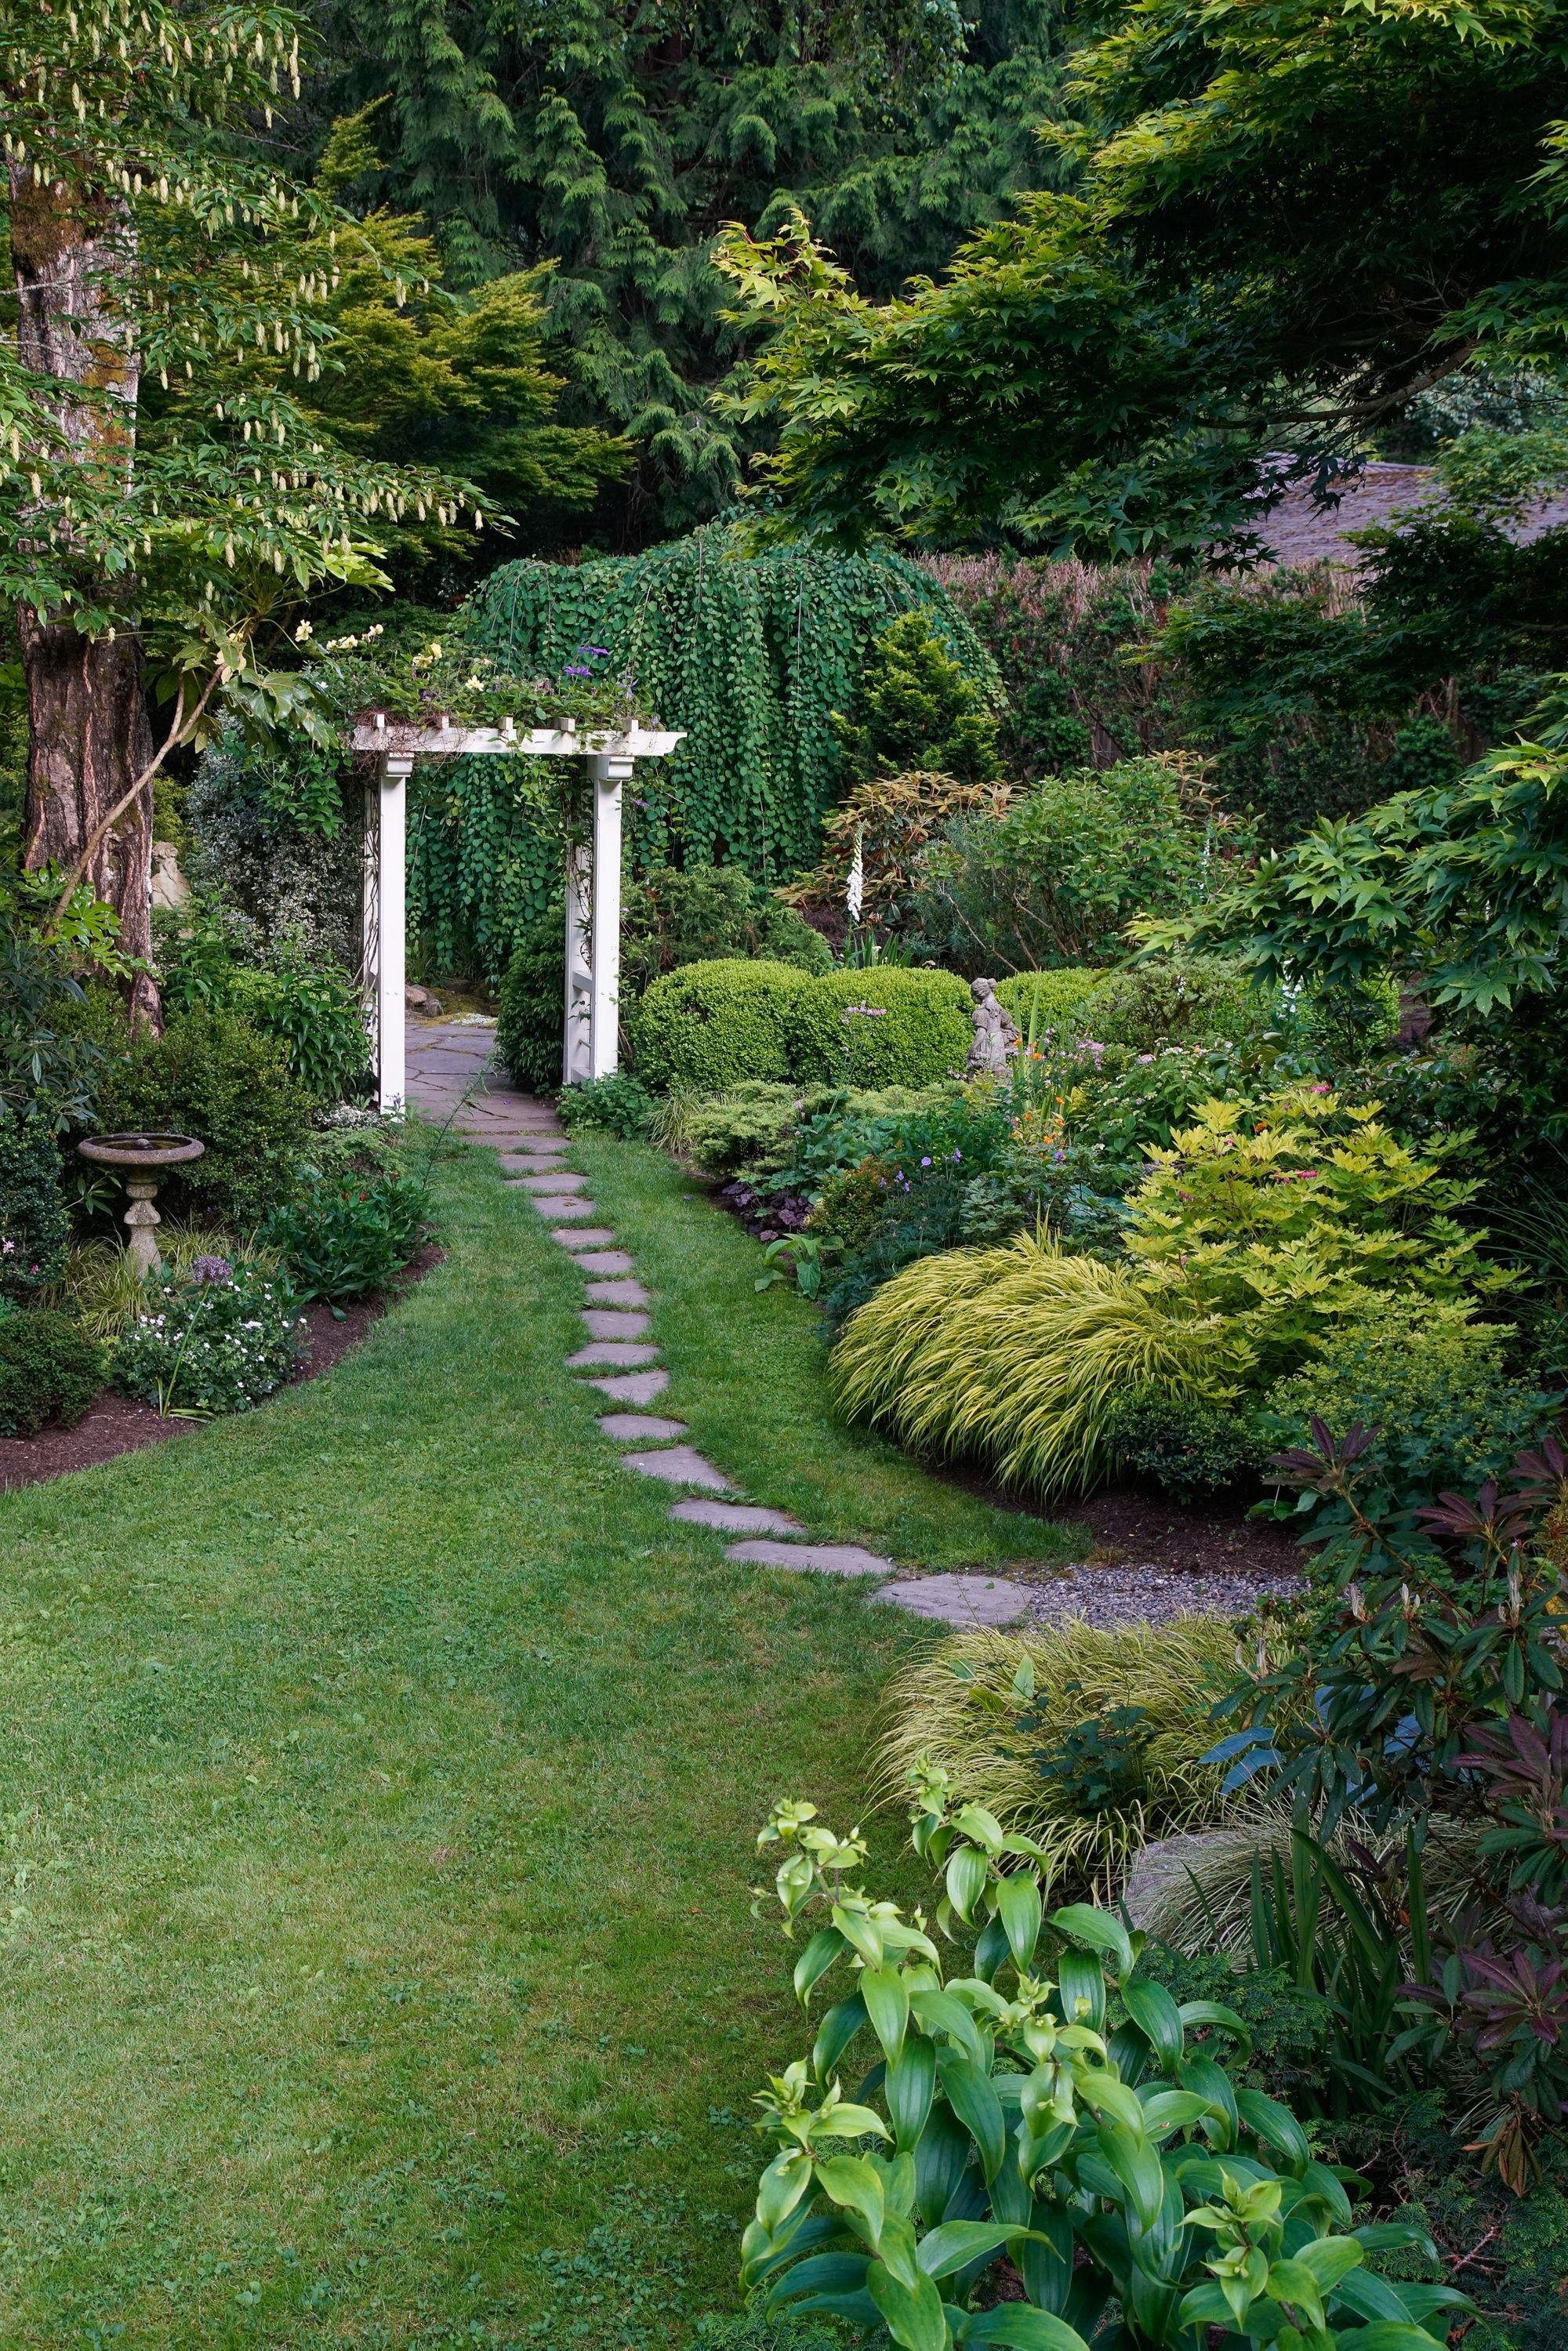 Creating a Beautiful Garden in the Shade